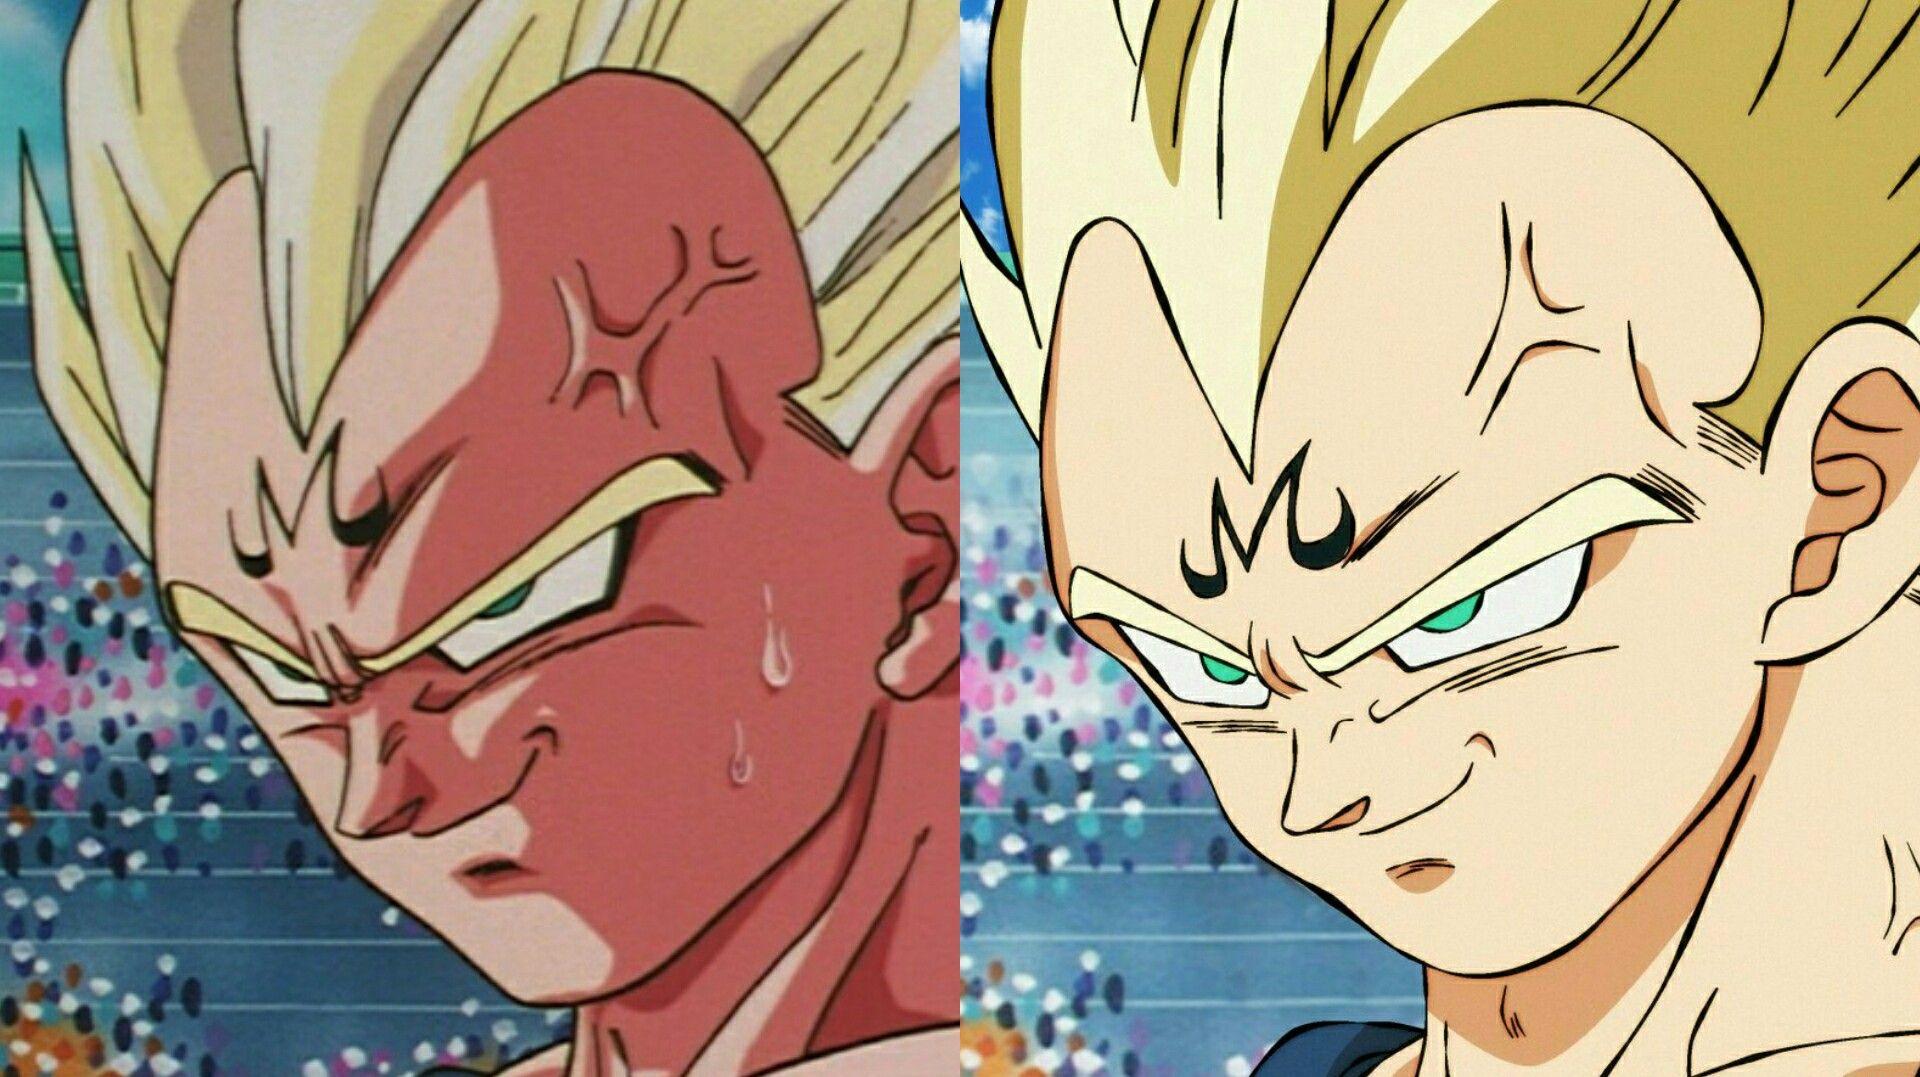 Old vs new majin vegeta (With images) Dragon ball